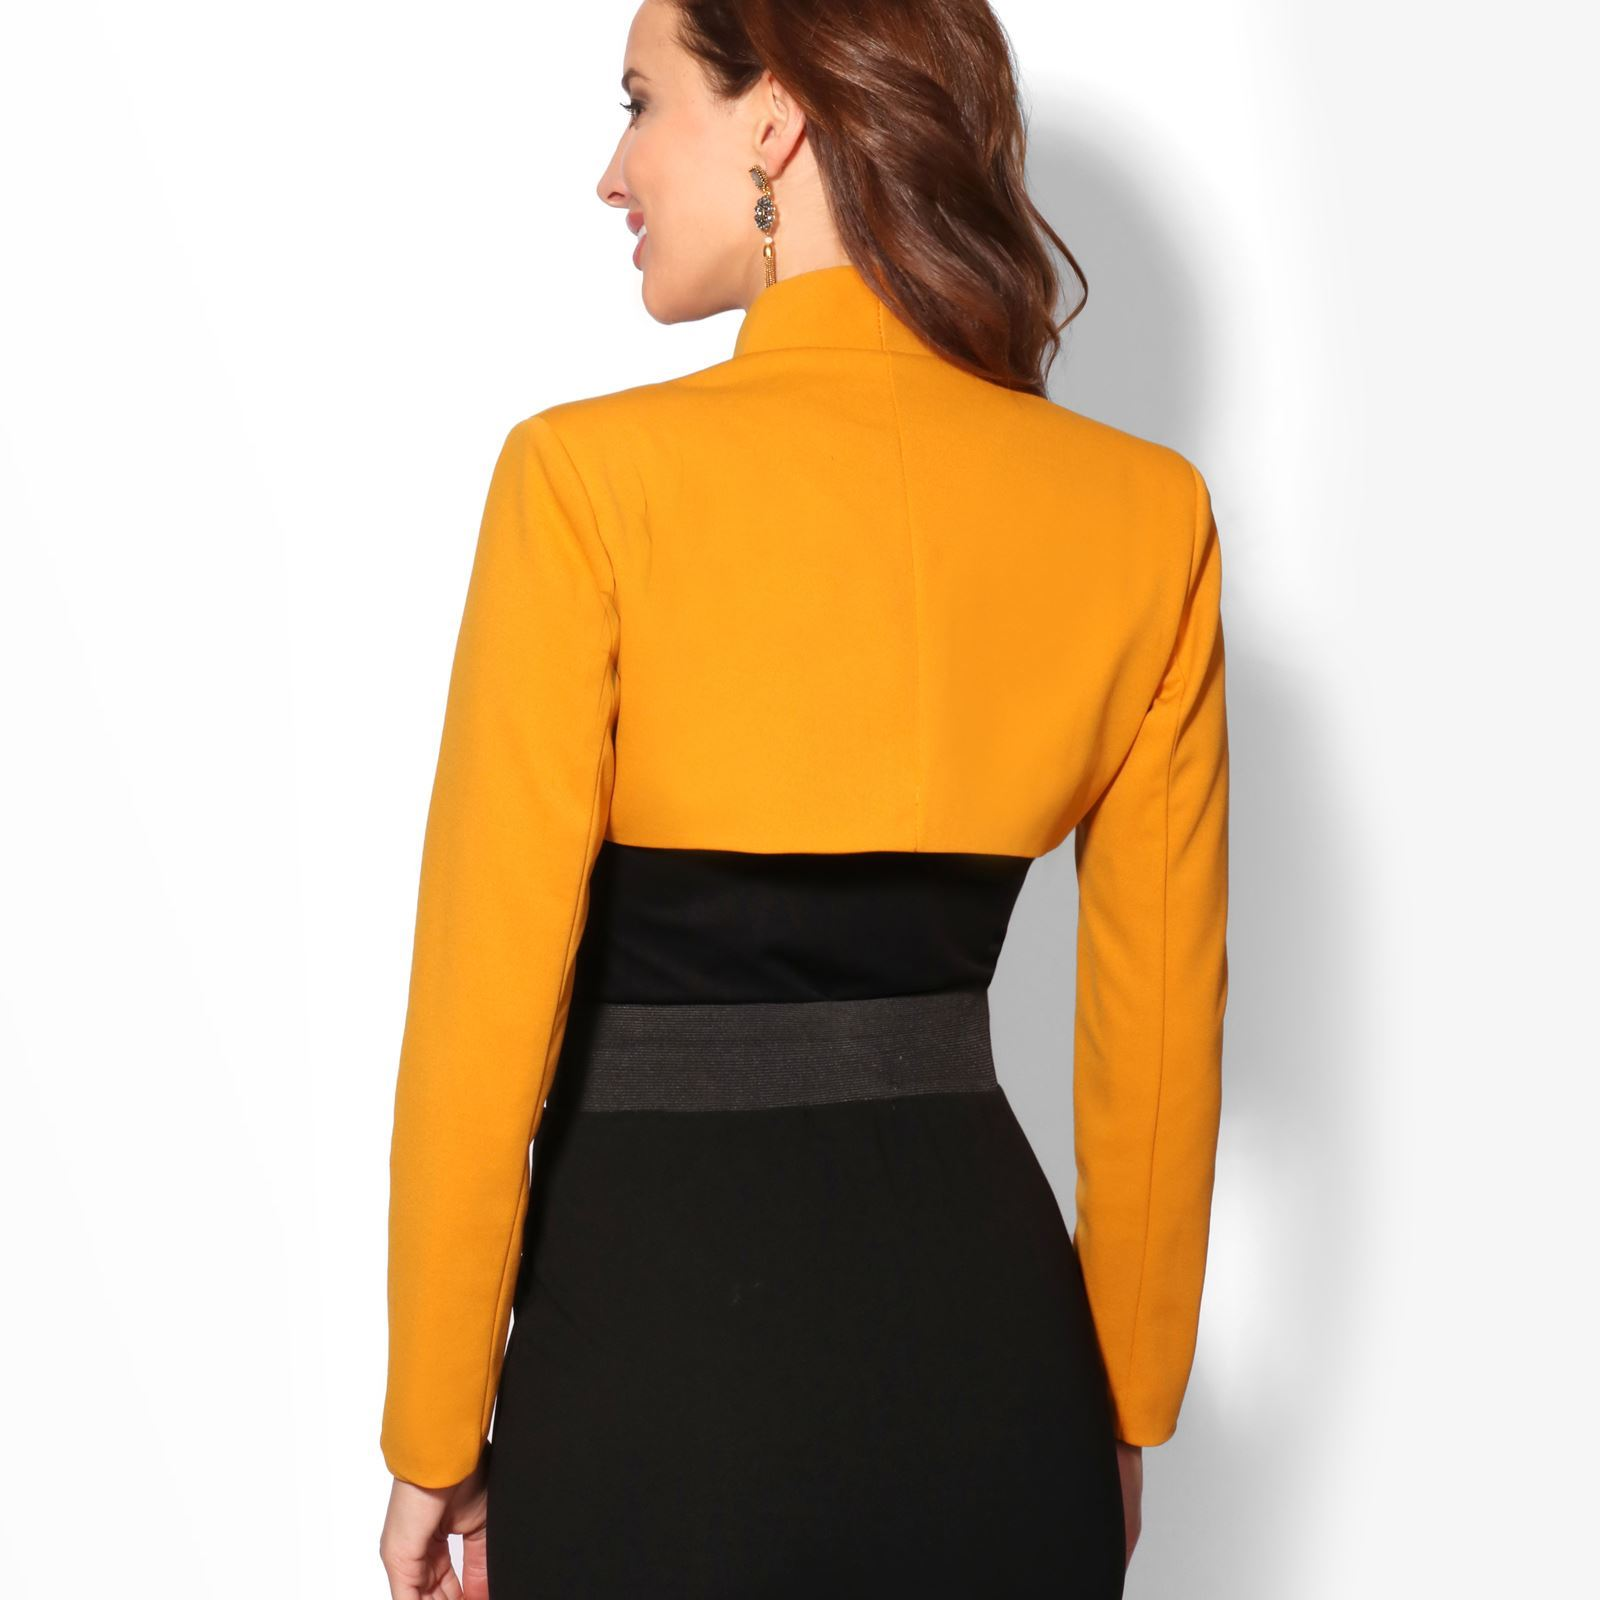 Womens-Ladies-Bolero-Jacket-Shrug-Chiffon-Long-Sleeve-Crop-Top-Blazer-Coat-Party thumbnail 7